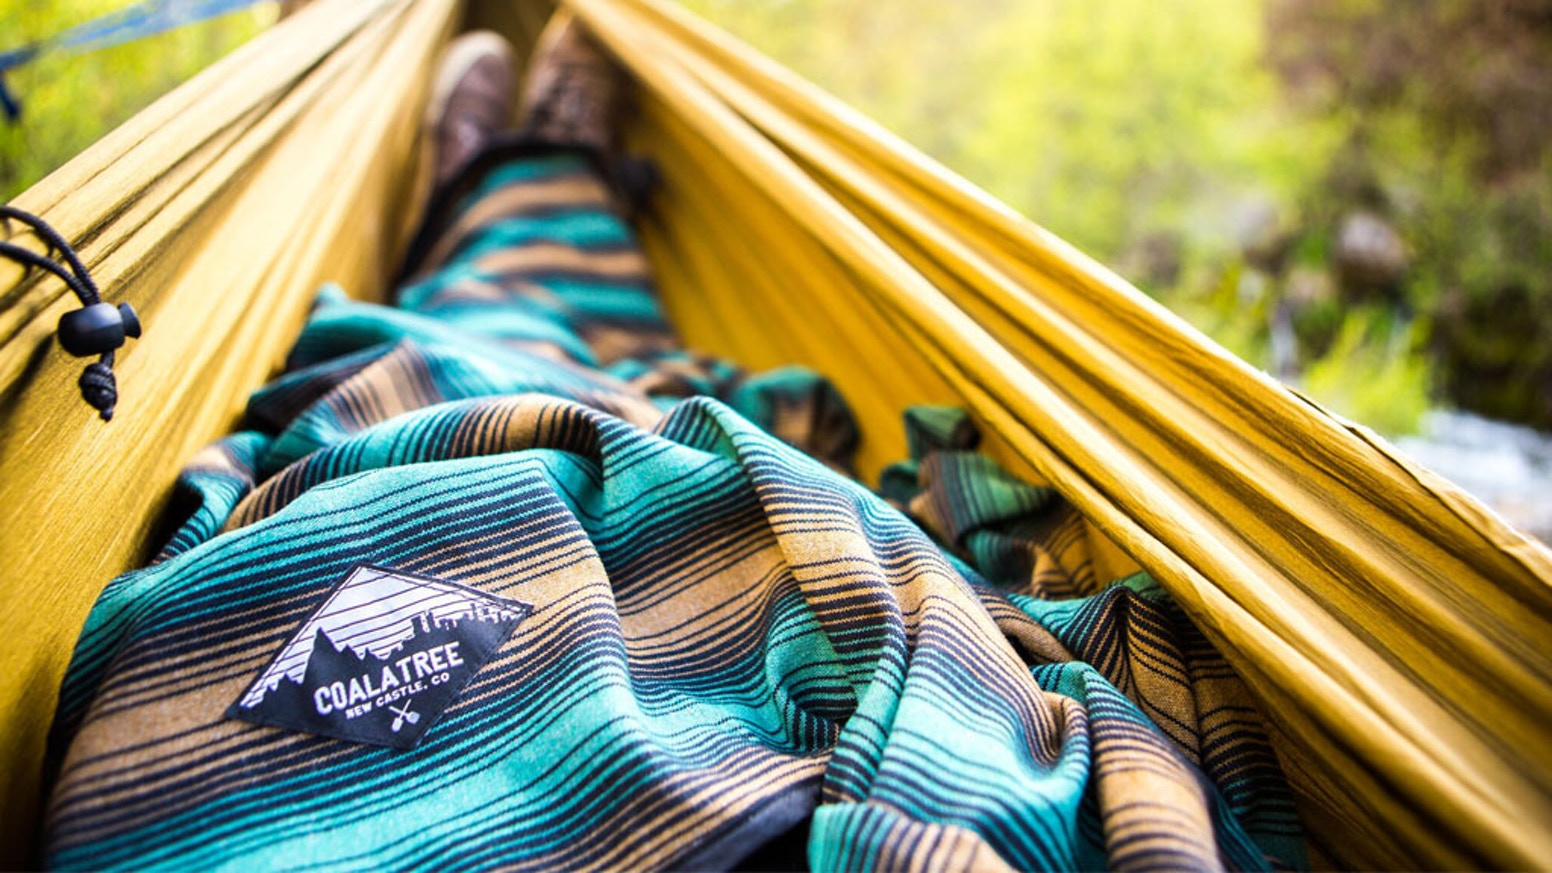 Waterproof, Packable and Versatile. The Kachula is the ultimate adventure blanket.